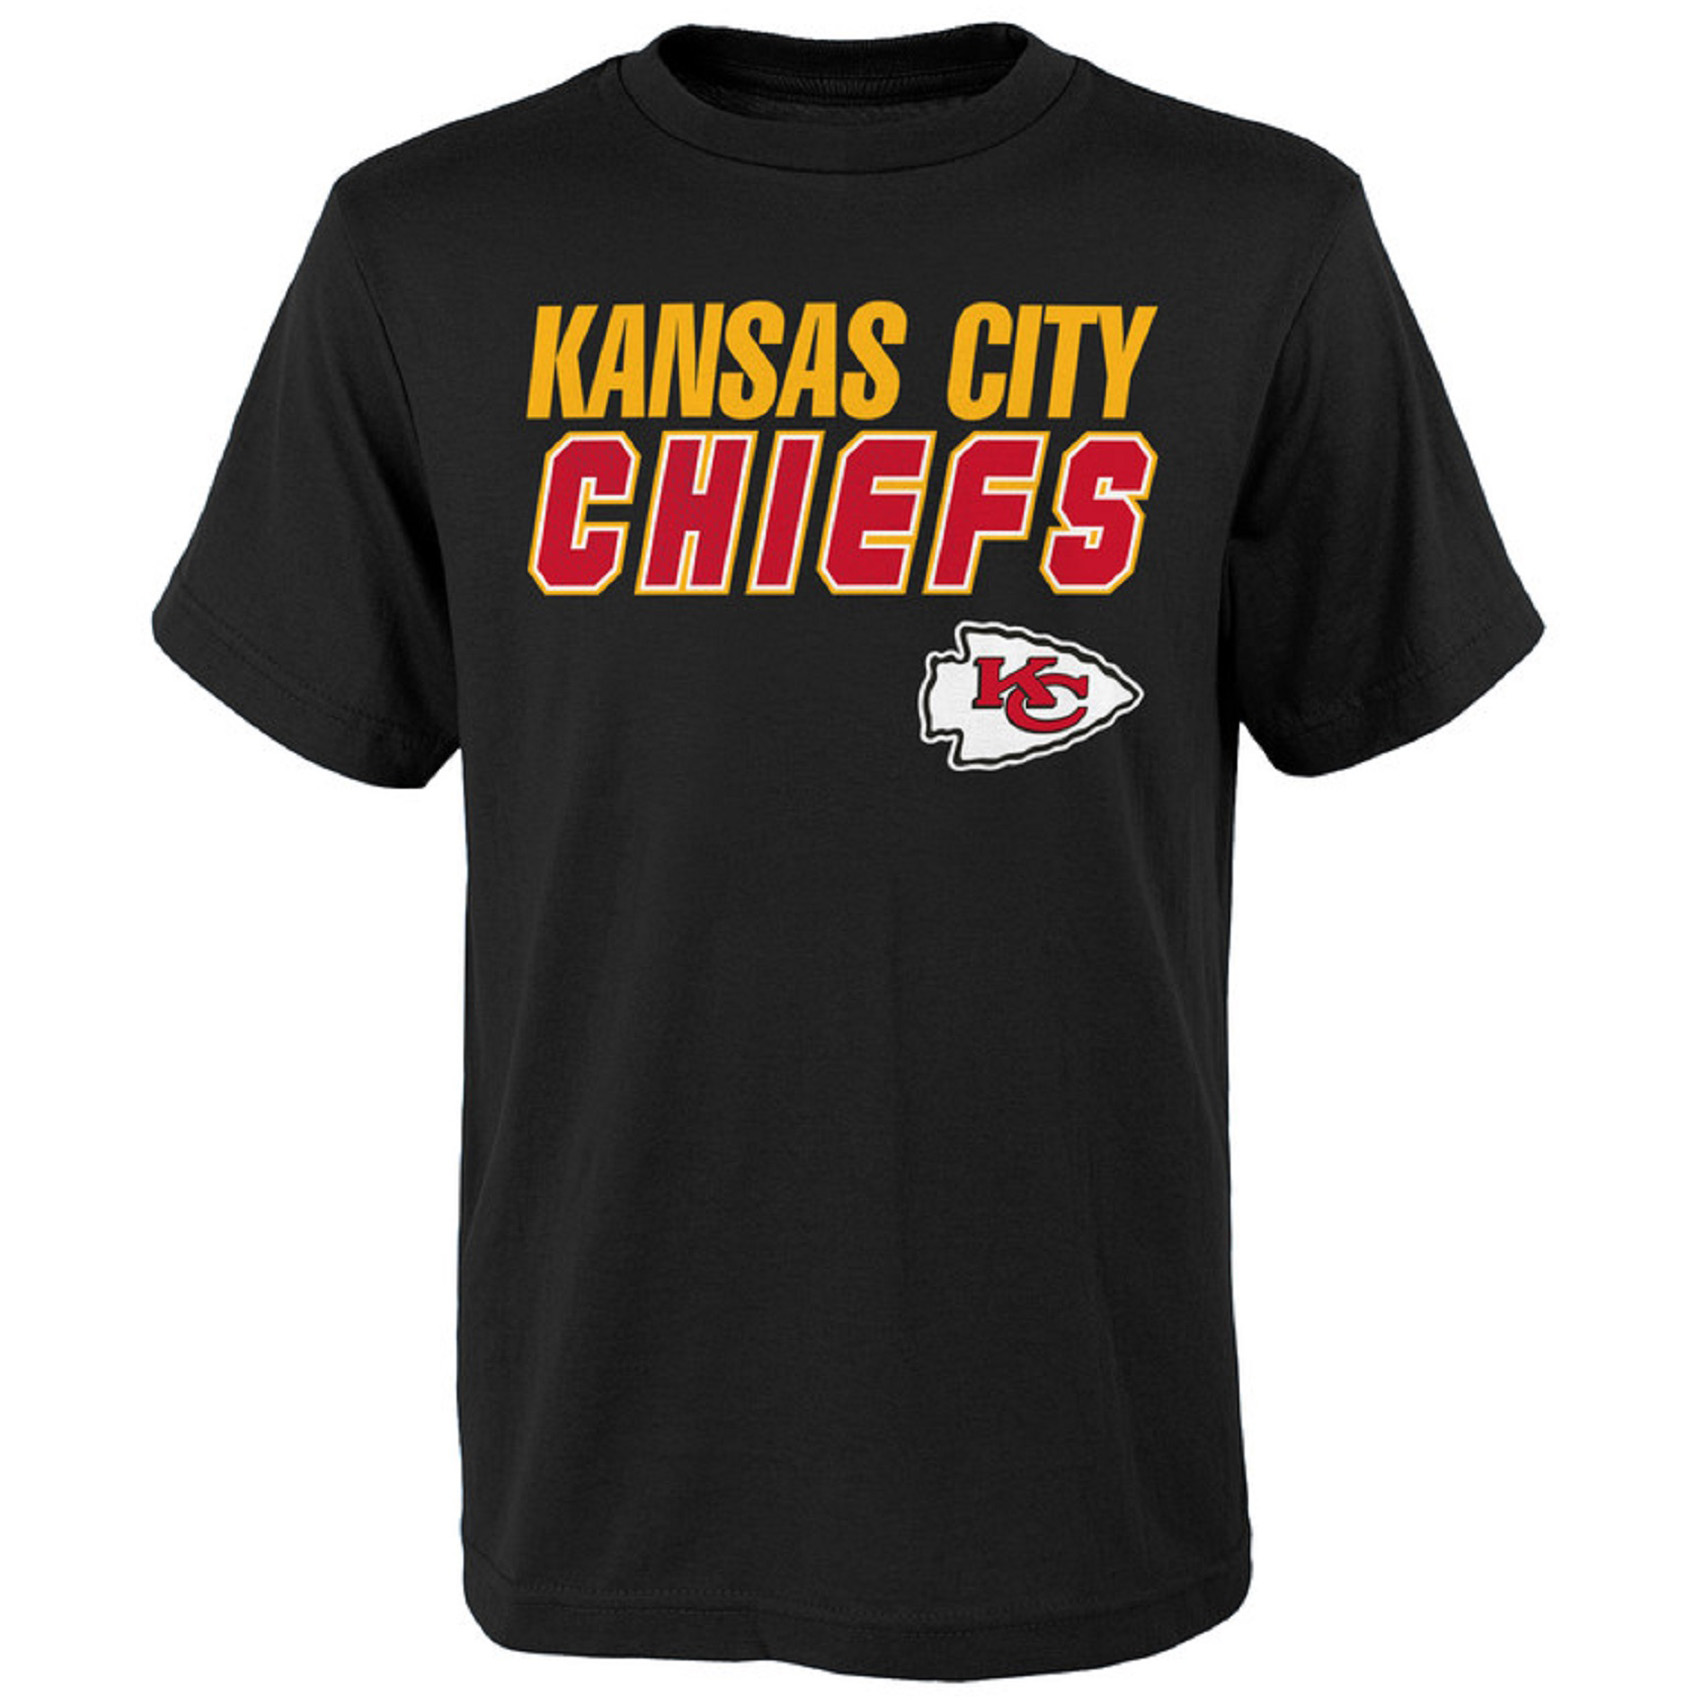 Youth Black Kansas City Chiefs Outline T-Shirt